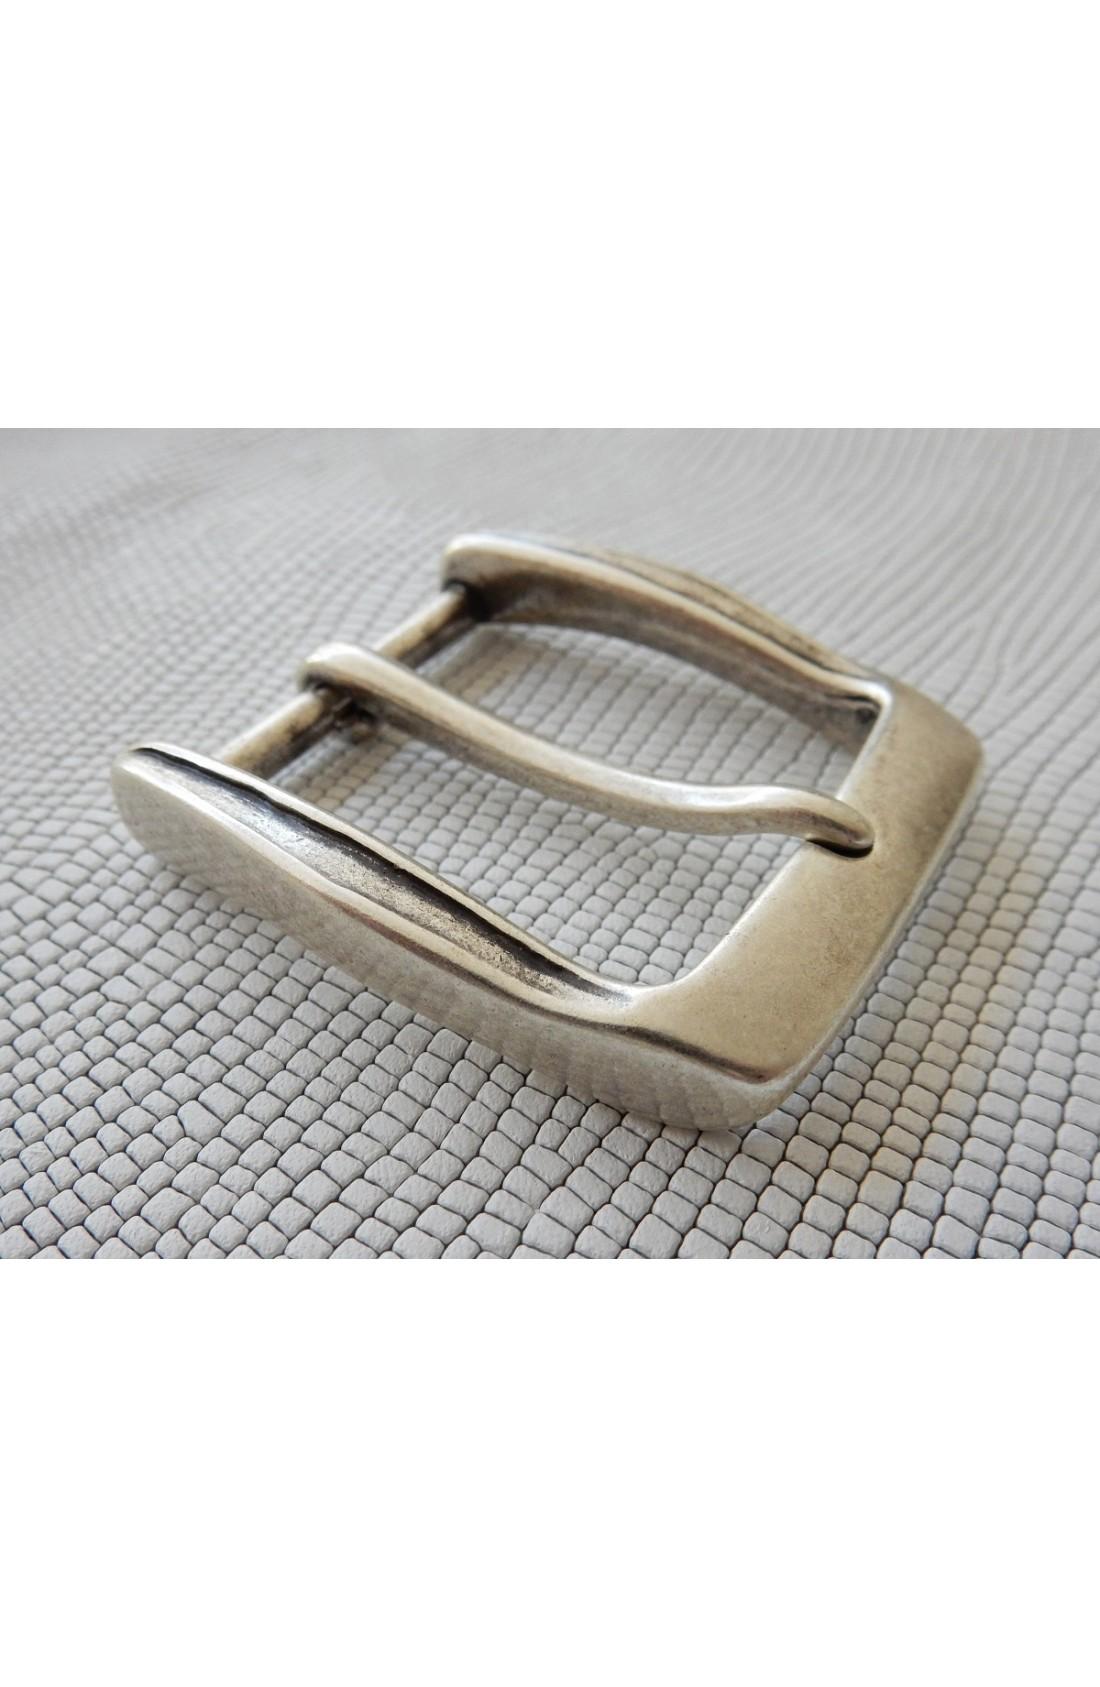 Fibbia Standard I 171 mm.35 argento inglese (2)